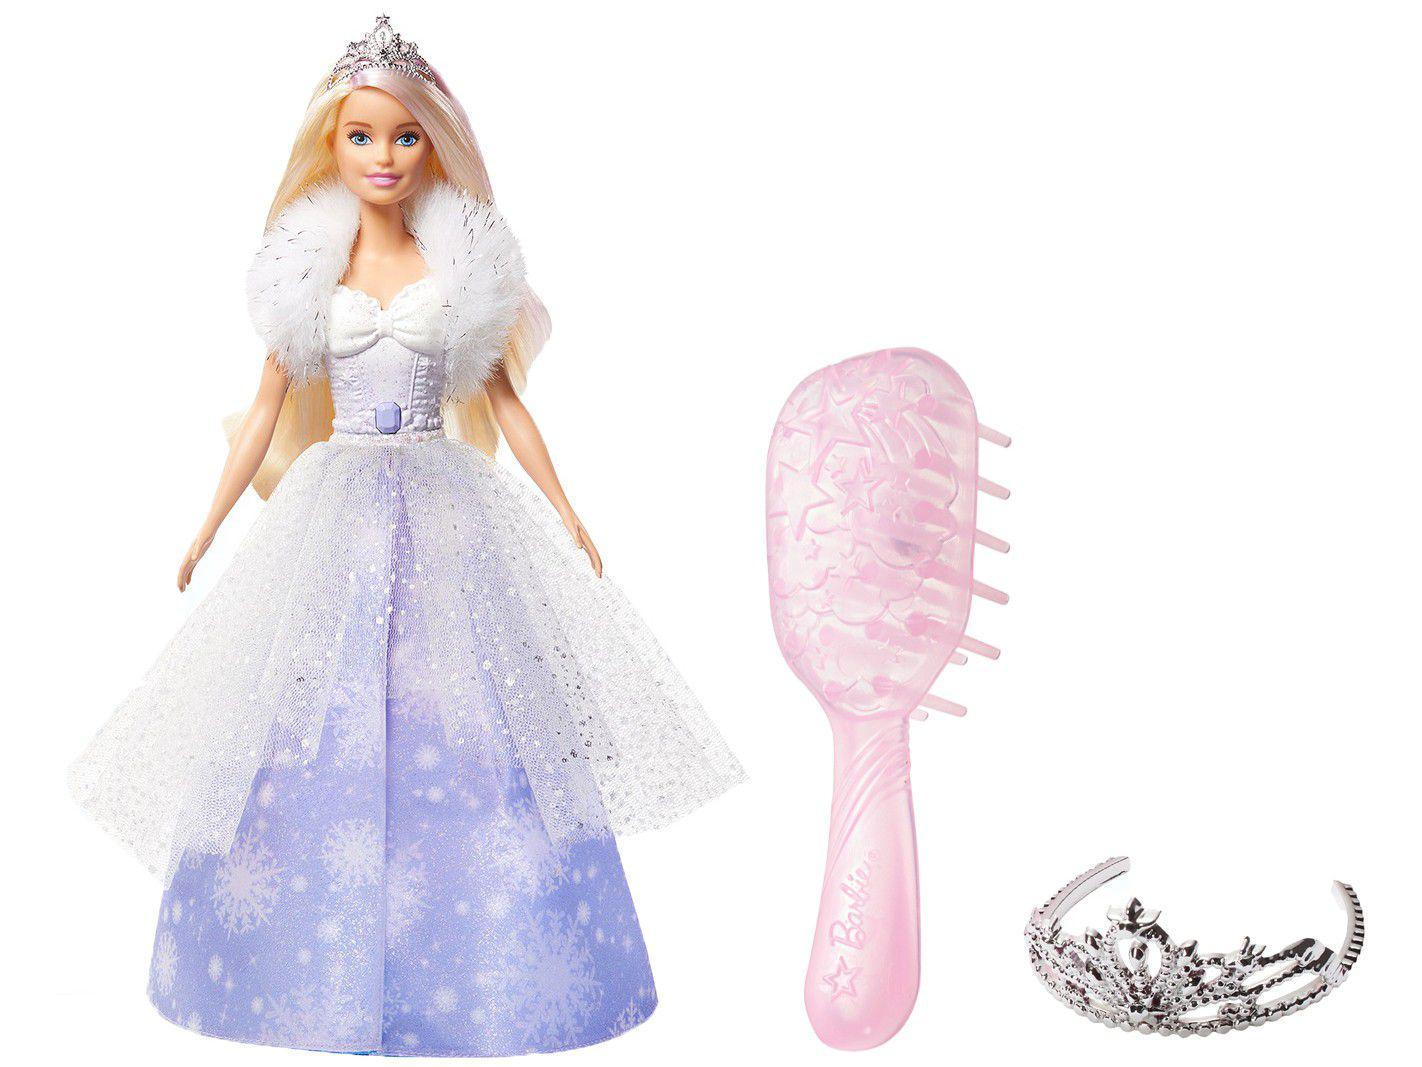 Boneca Barbie Princesa: Dreamtopia - Mattel